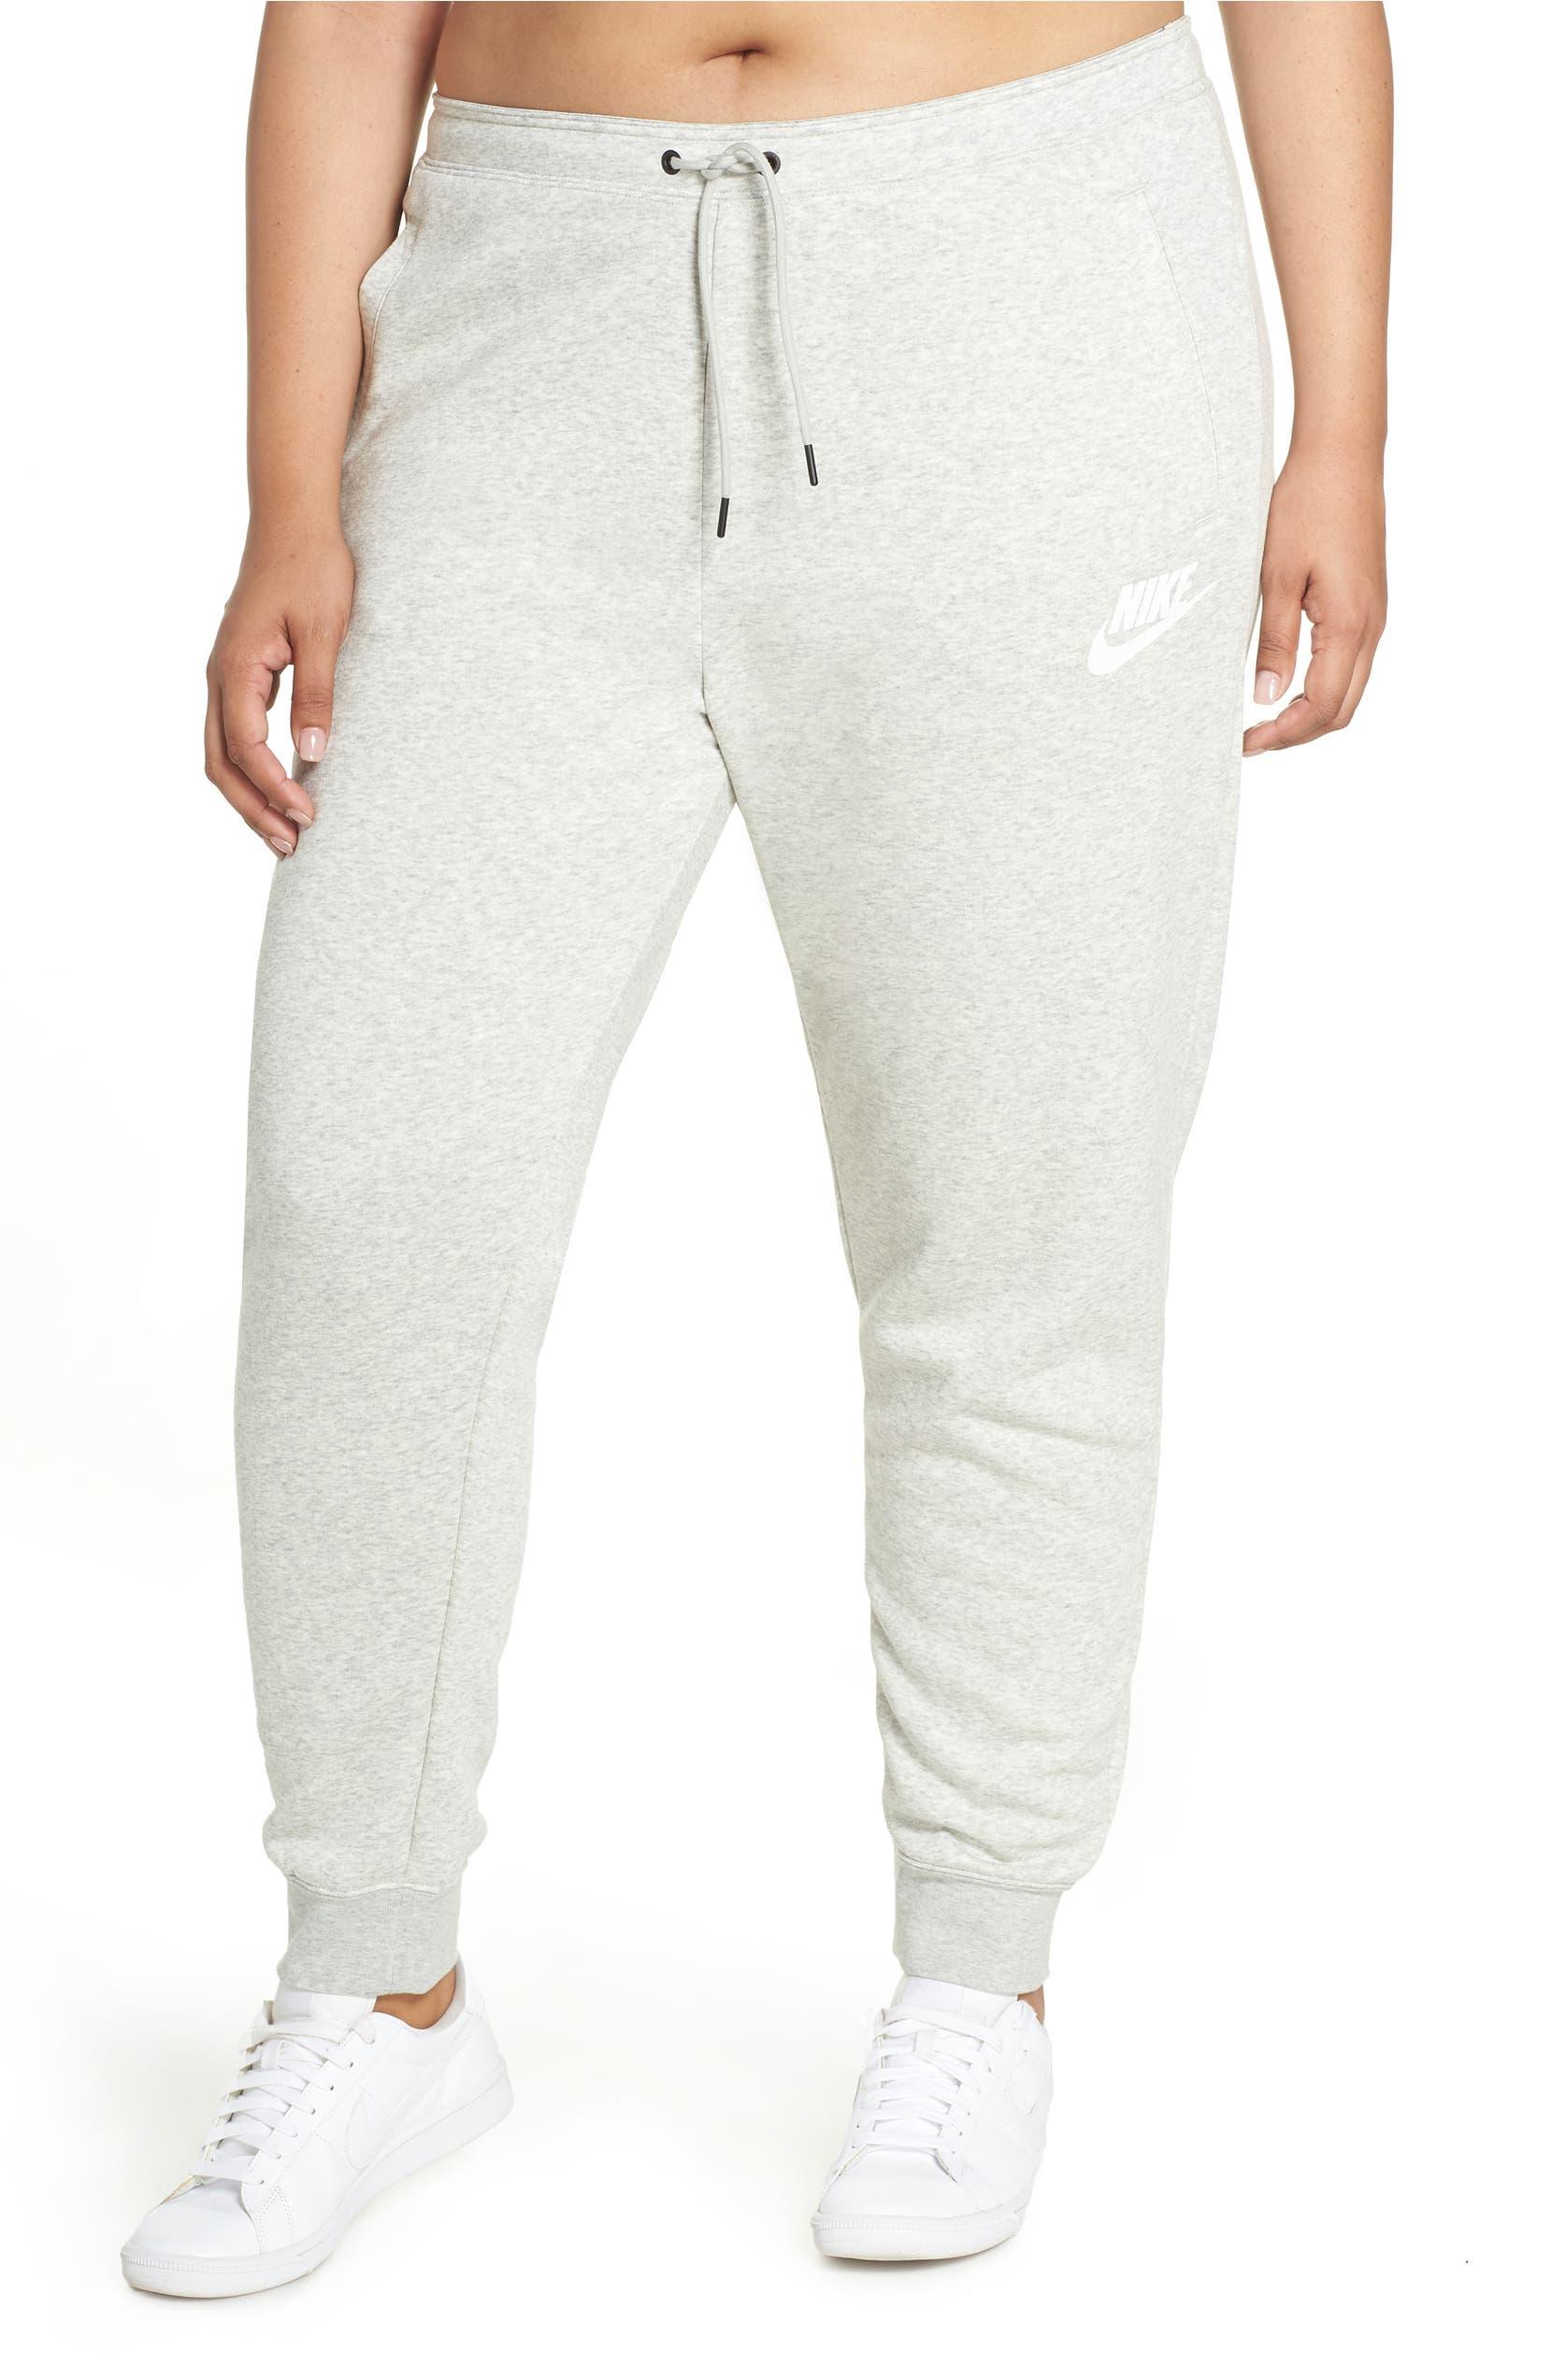 d0f5431afad Nike Sportswear Rally High Rise Jogger Pants (Plus Size)